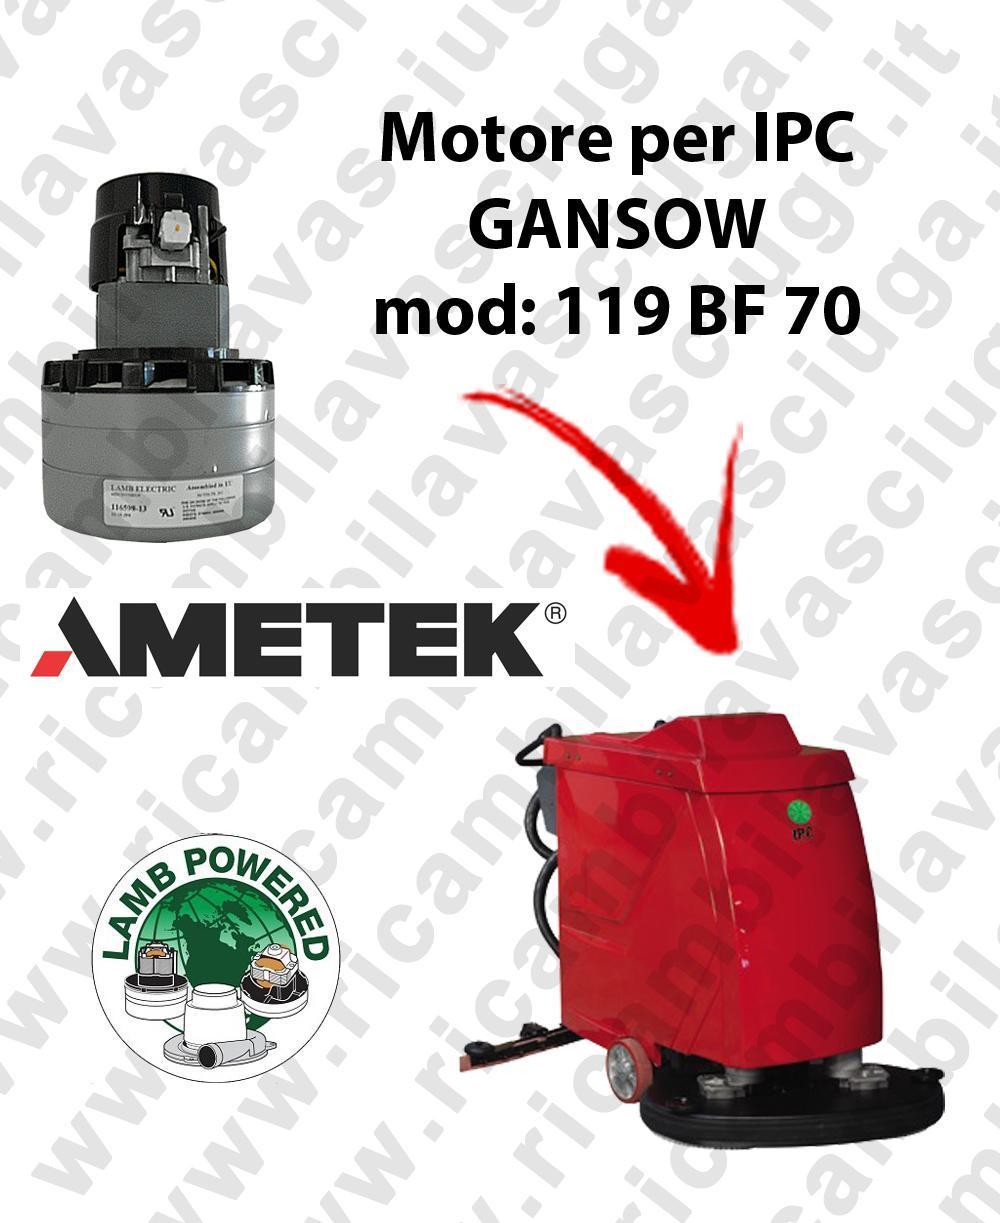 119 BF 70 LAMB AMETEK vacuum motor for scrubber dryer IPC GANSOW